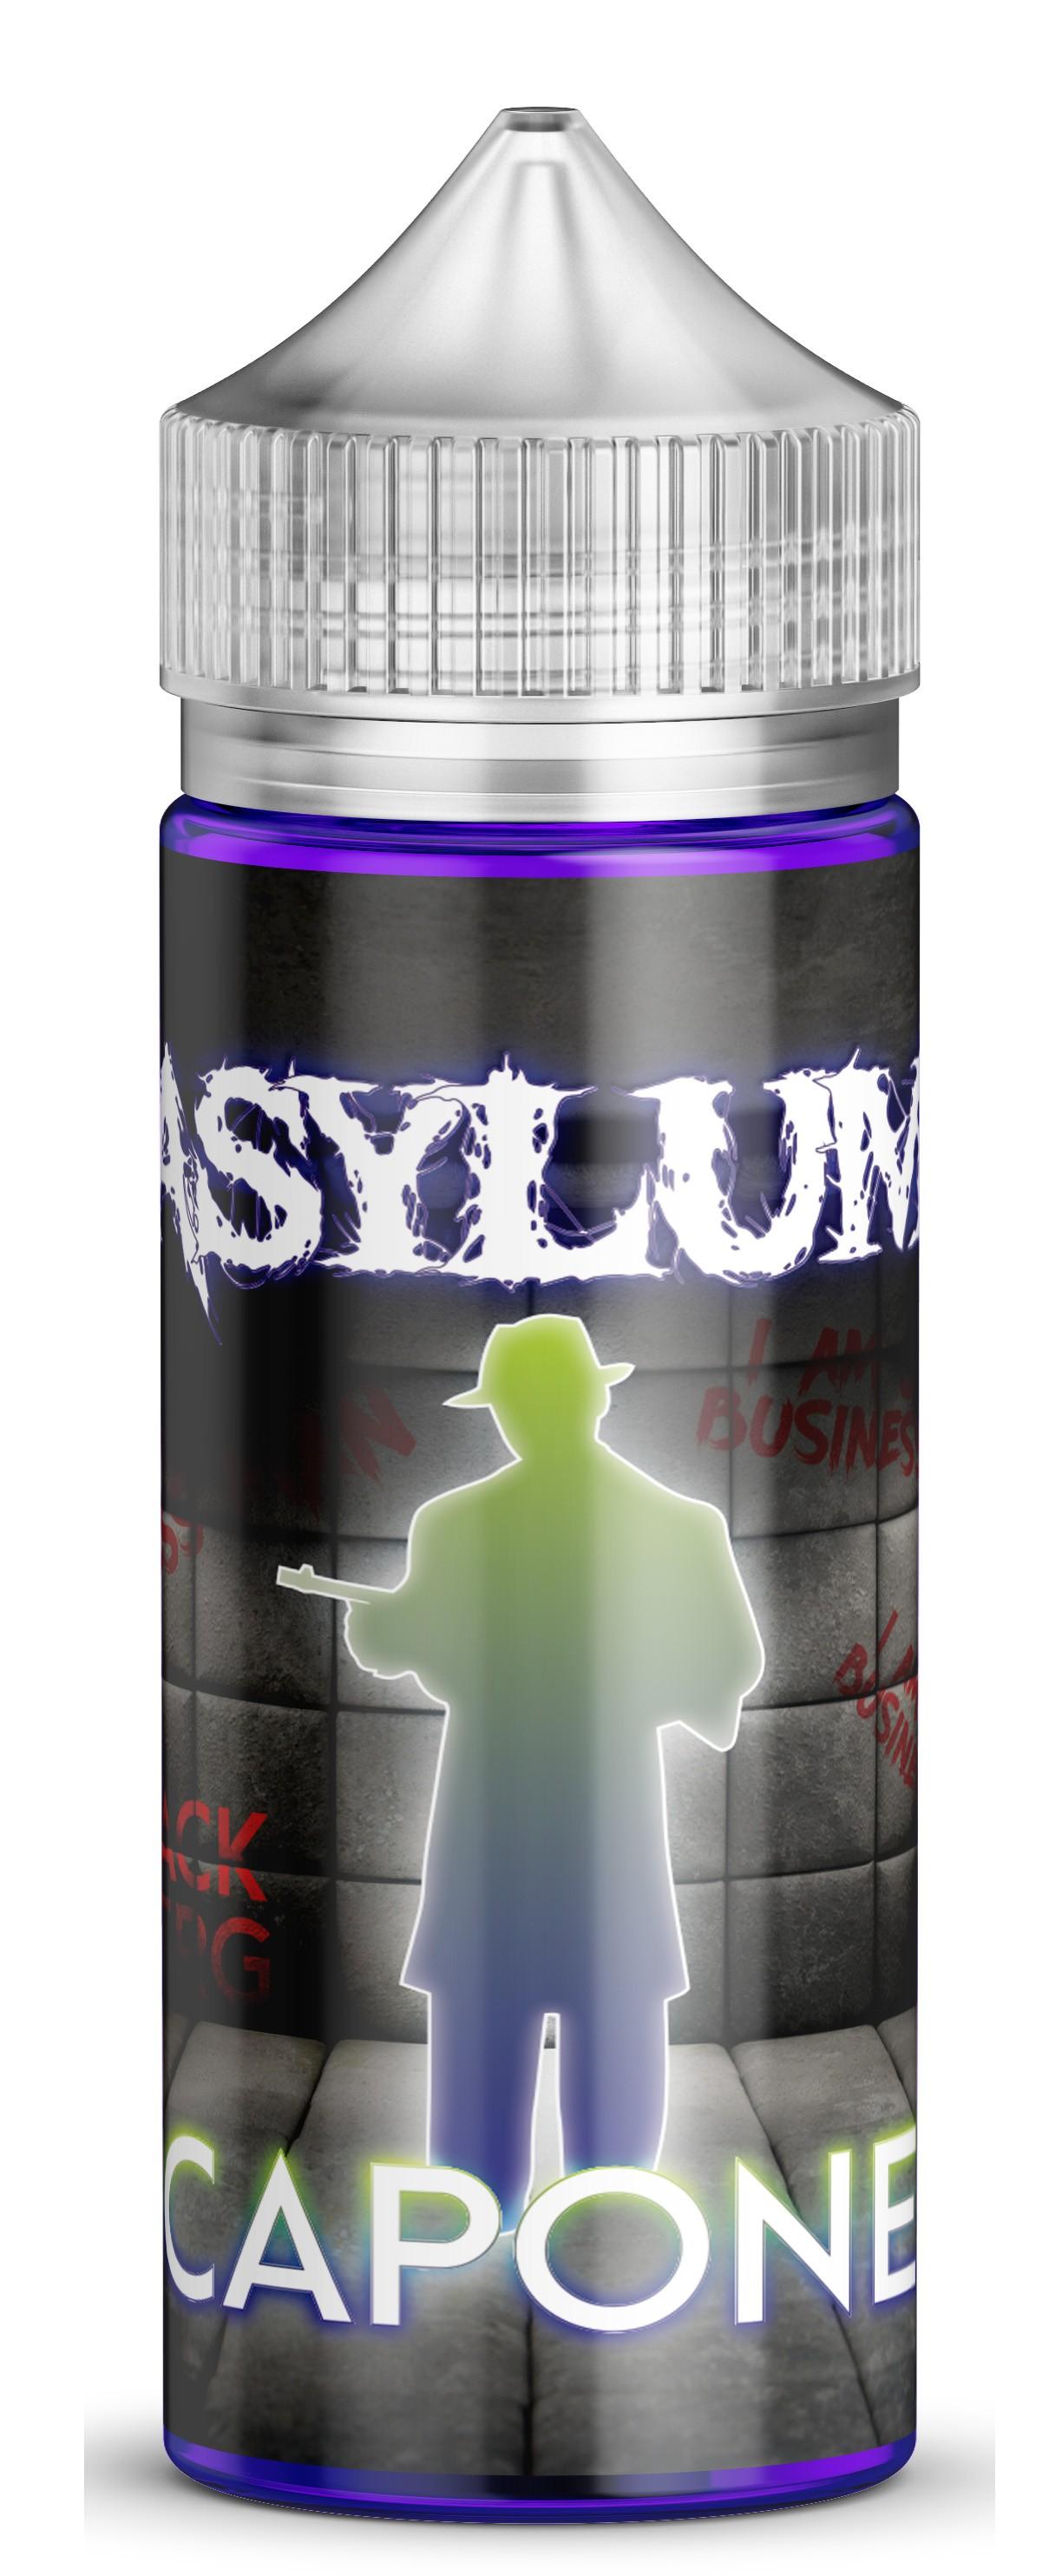 Capone - Asylum 100ml